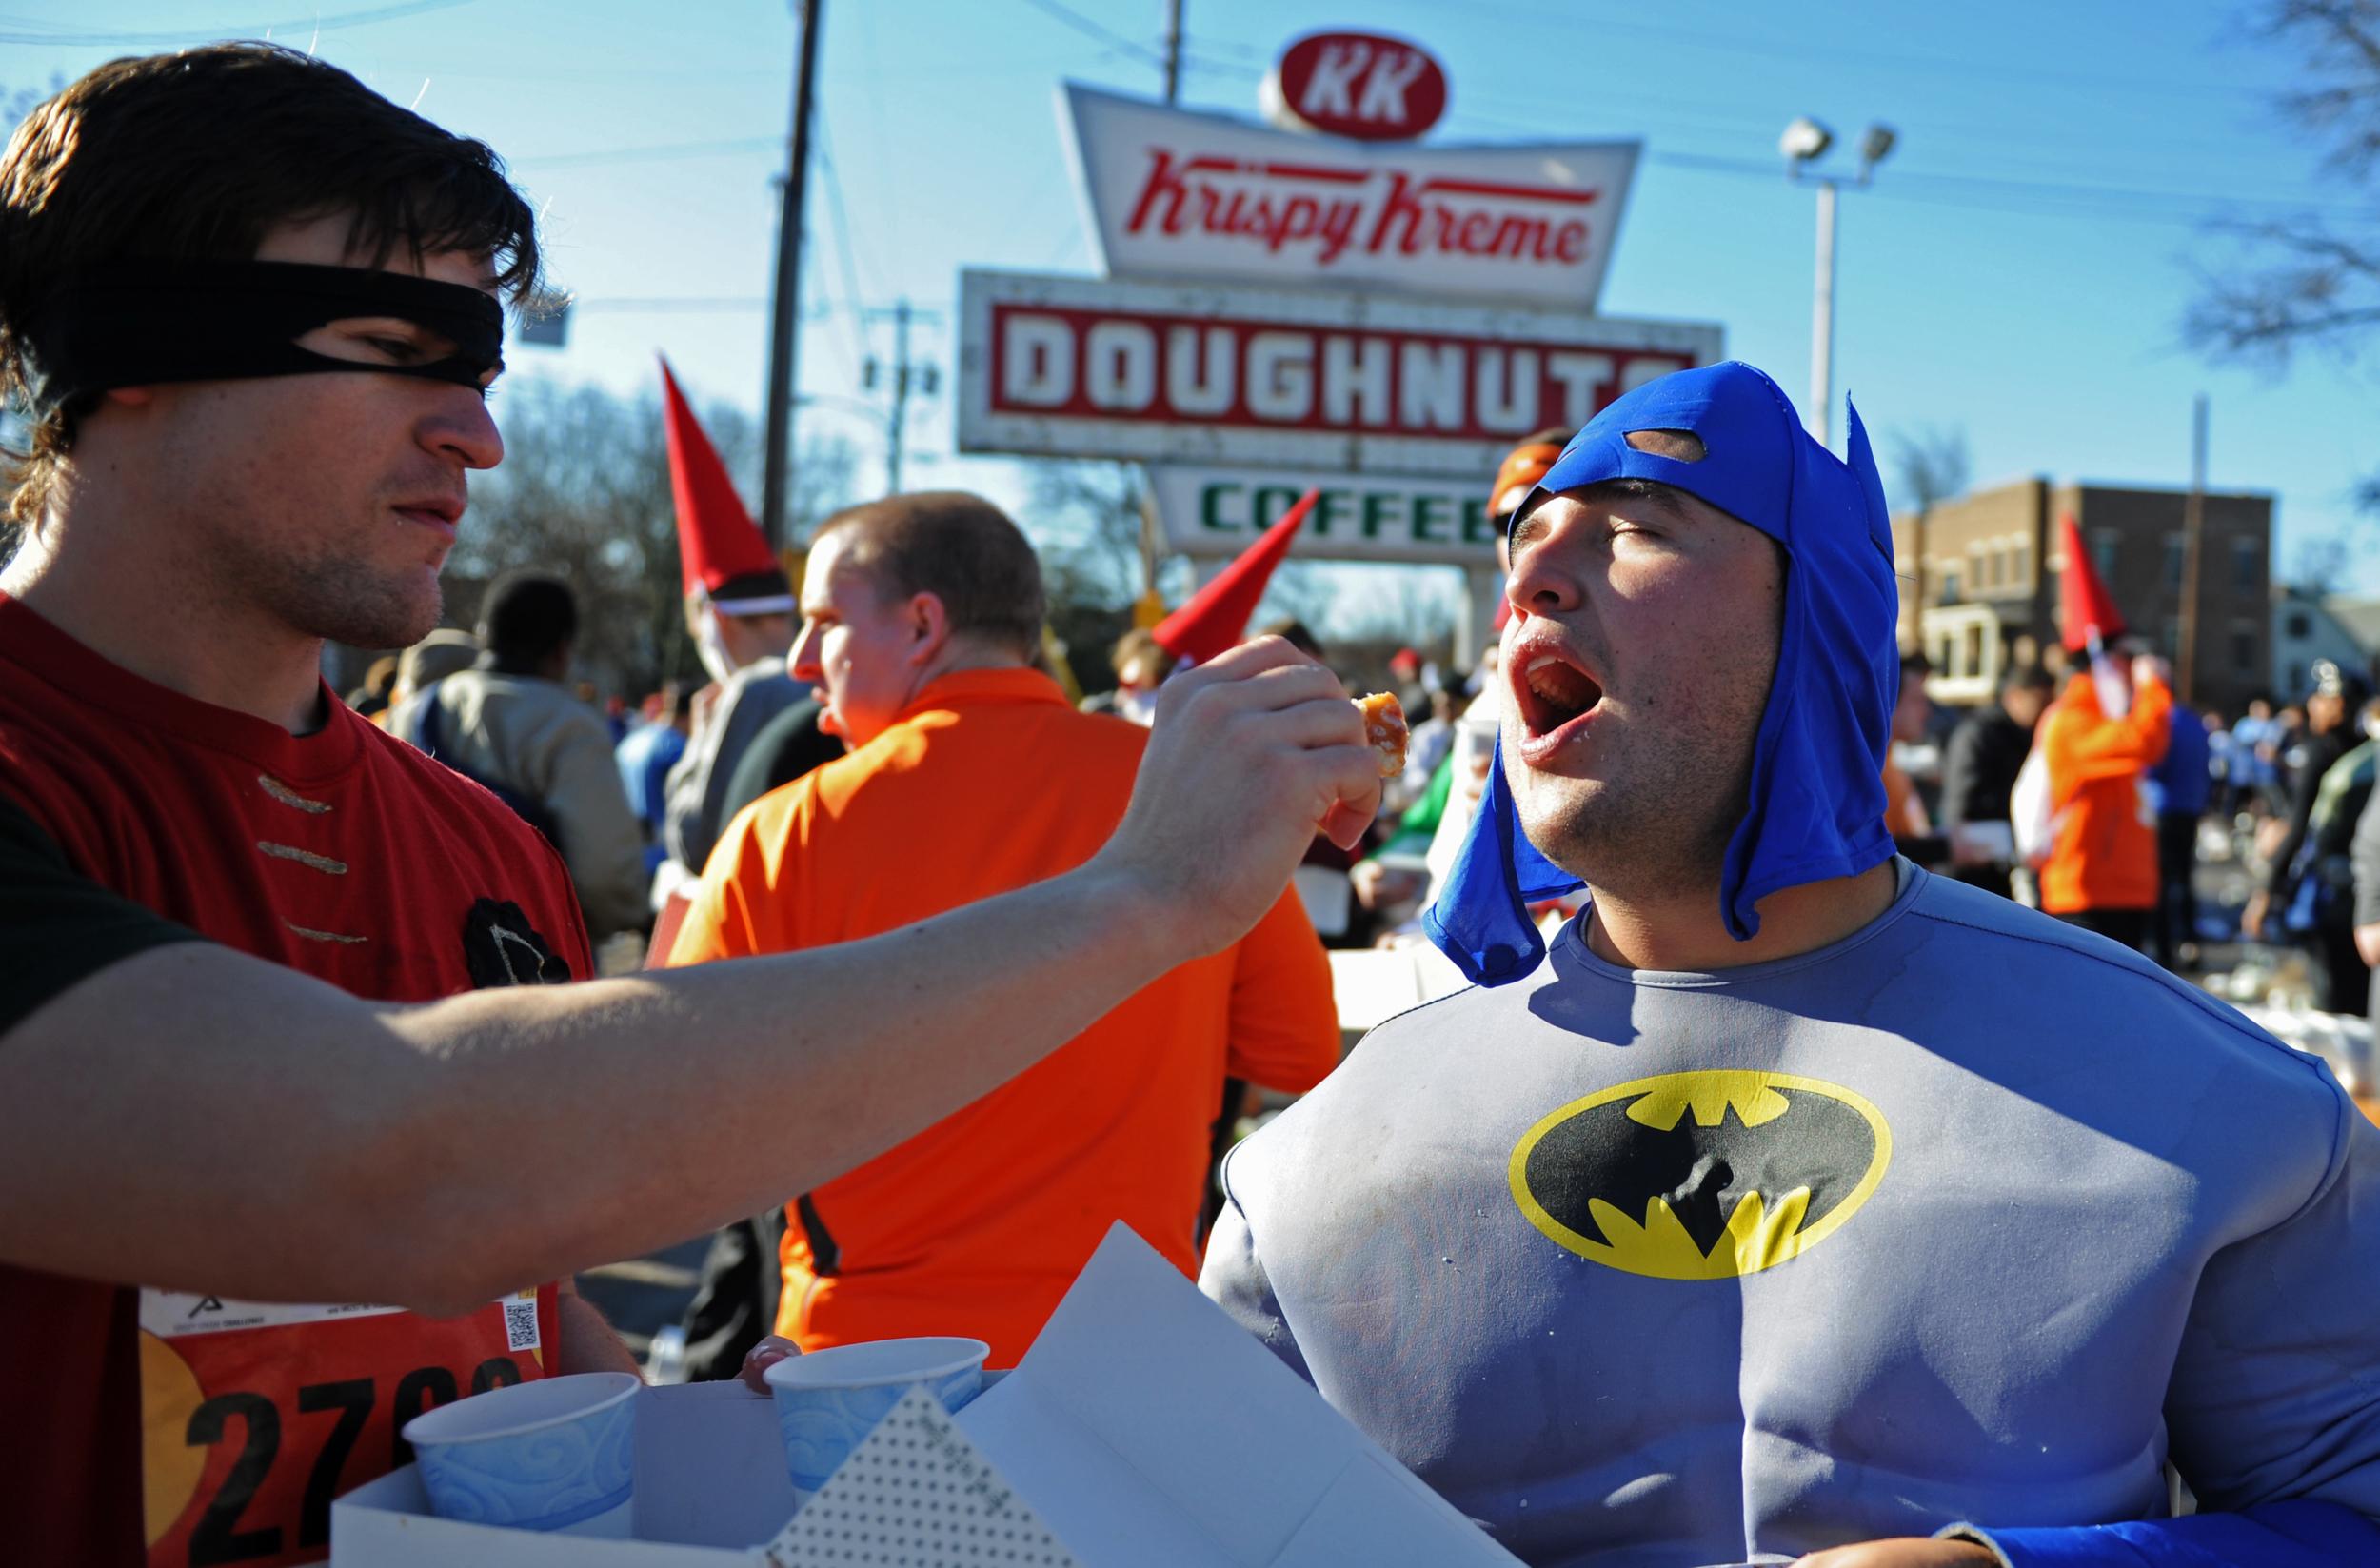 Cullen Domaracki, dressed as Robin, feeds a doughnut to his friend, Jonathan Arcila, dressed as Batman, during the Krispy Kreme Challenge on Saturday, February 9, 2013 in Raleigh, N.C.